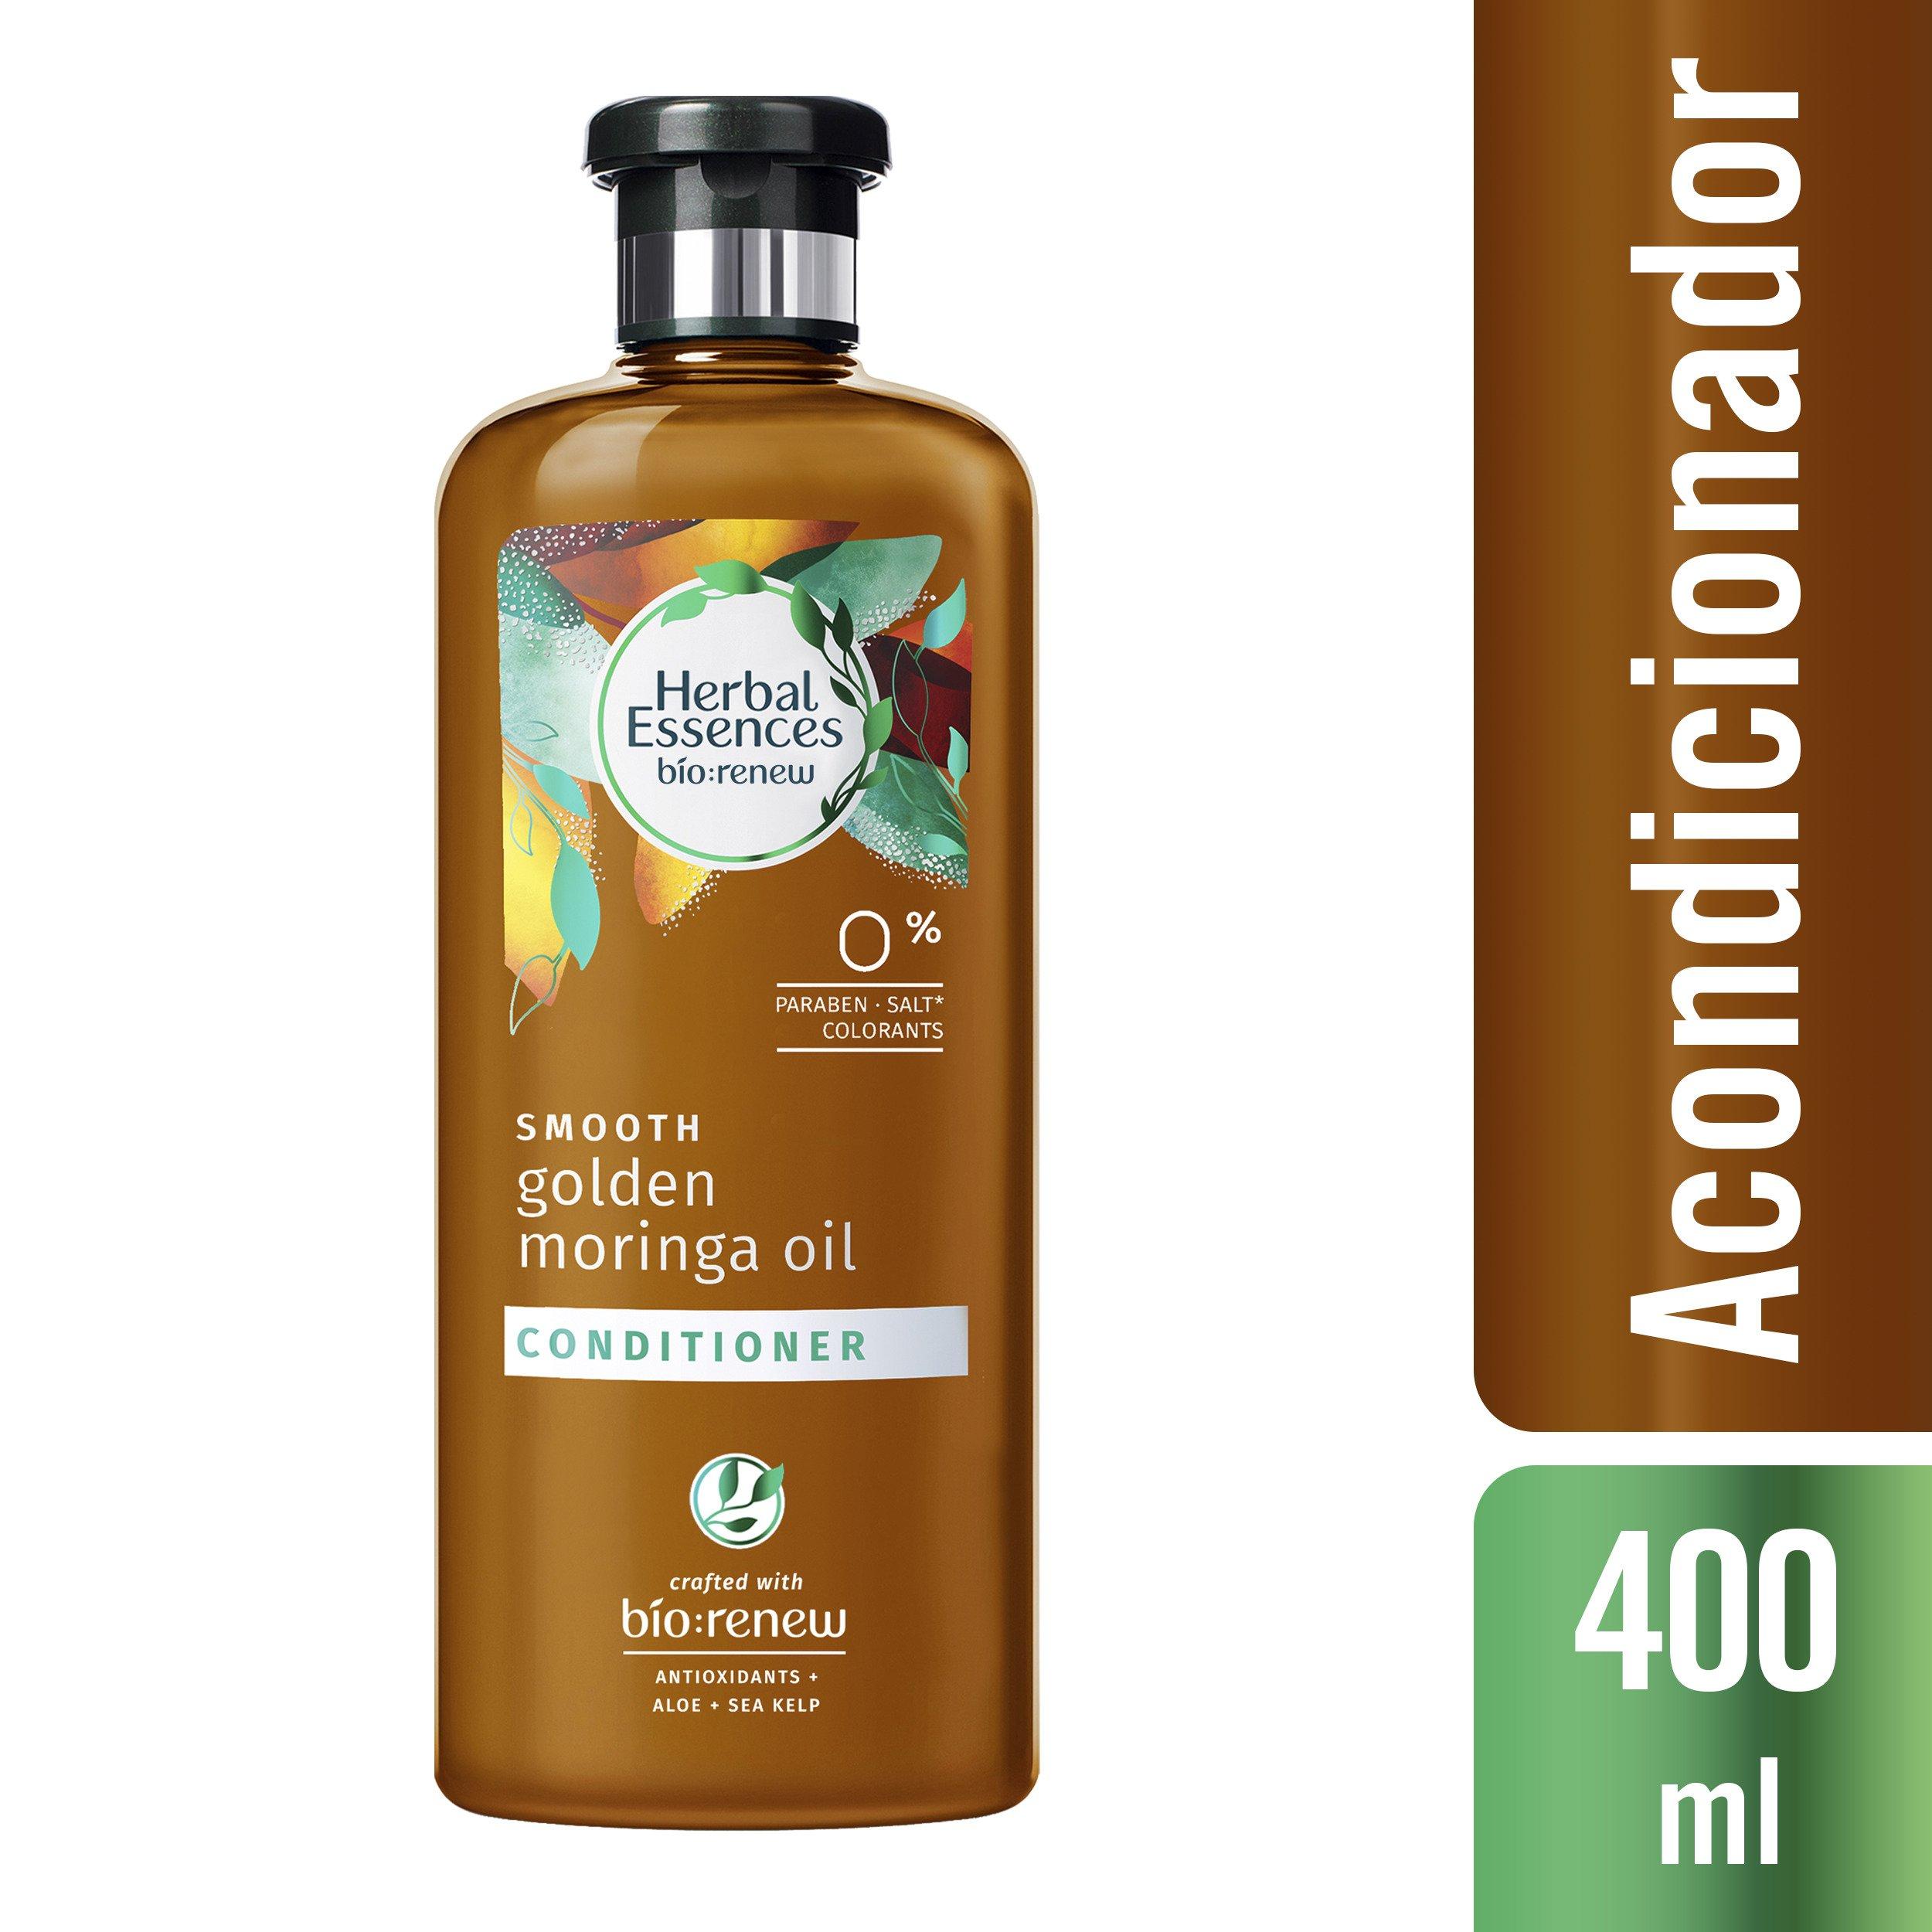 Herbal Essences Golden Moringa Oil Shampoo, 13.5 Fluid